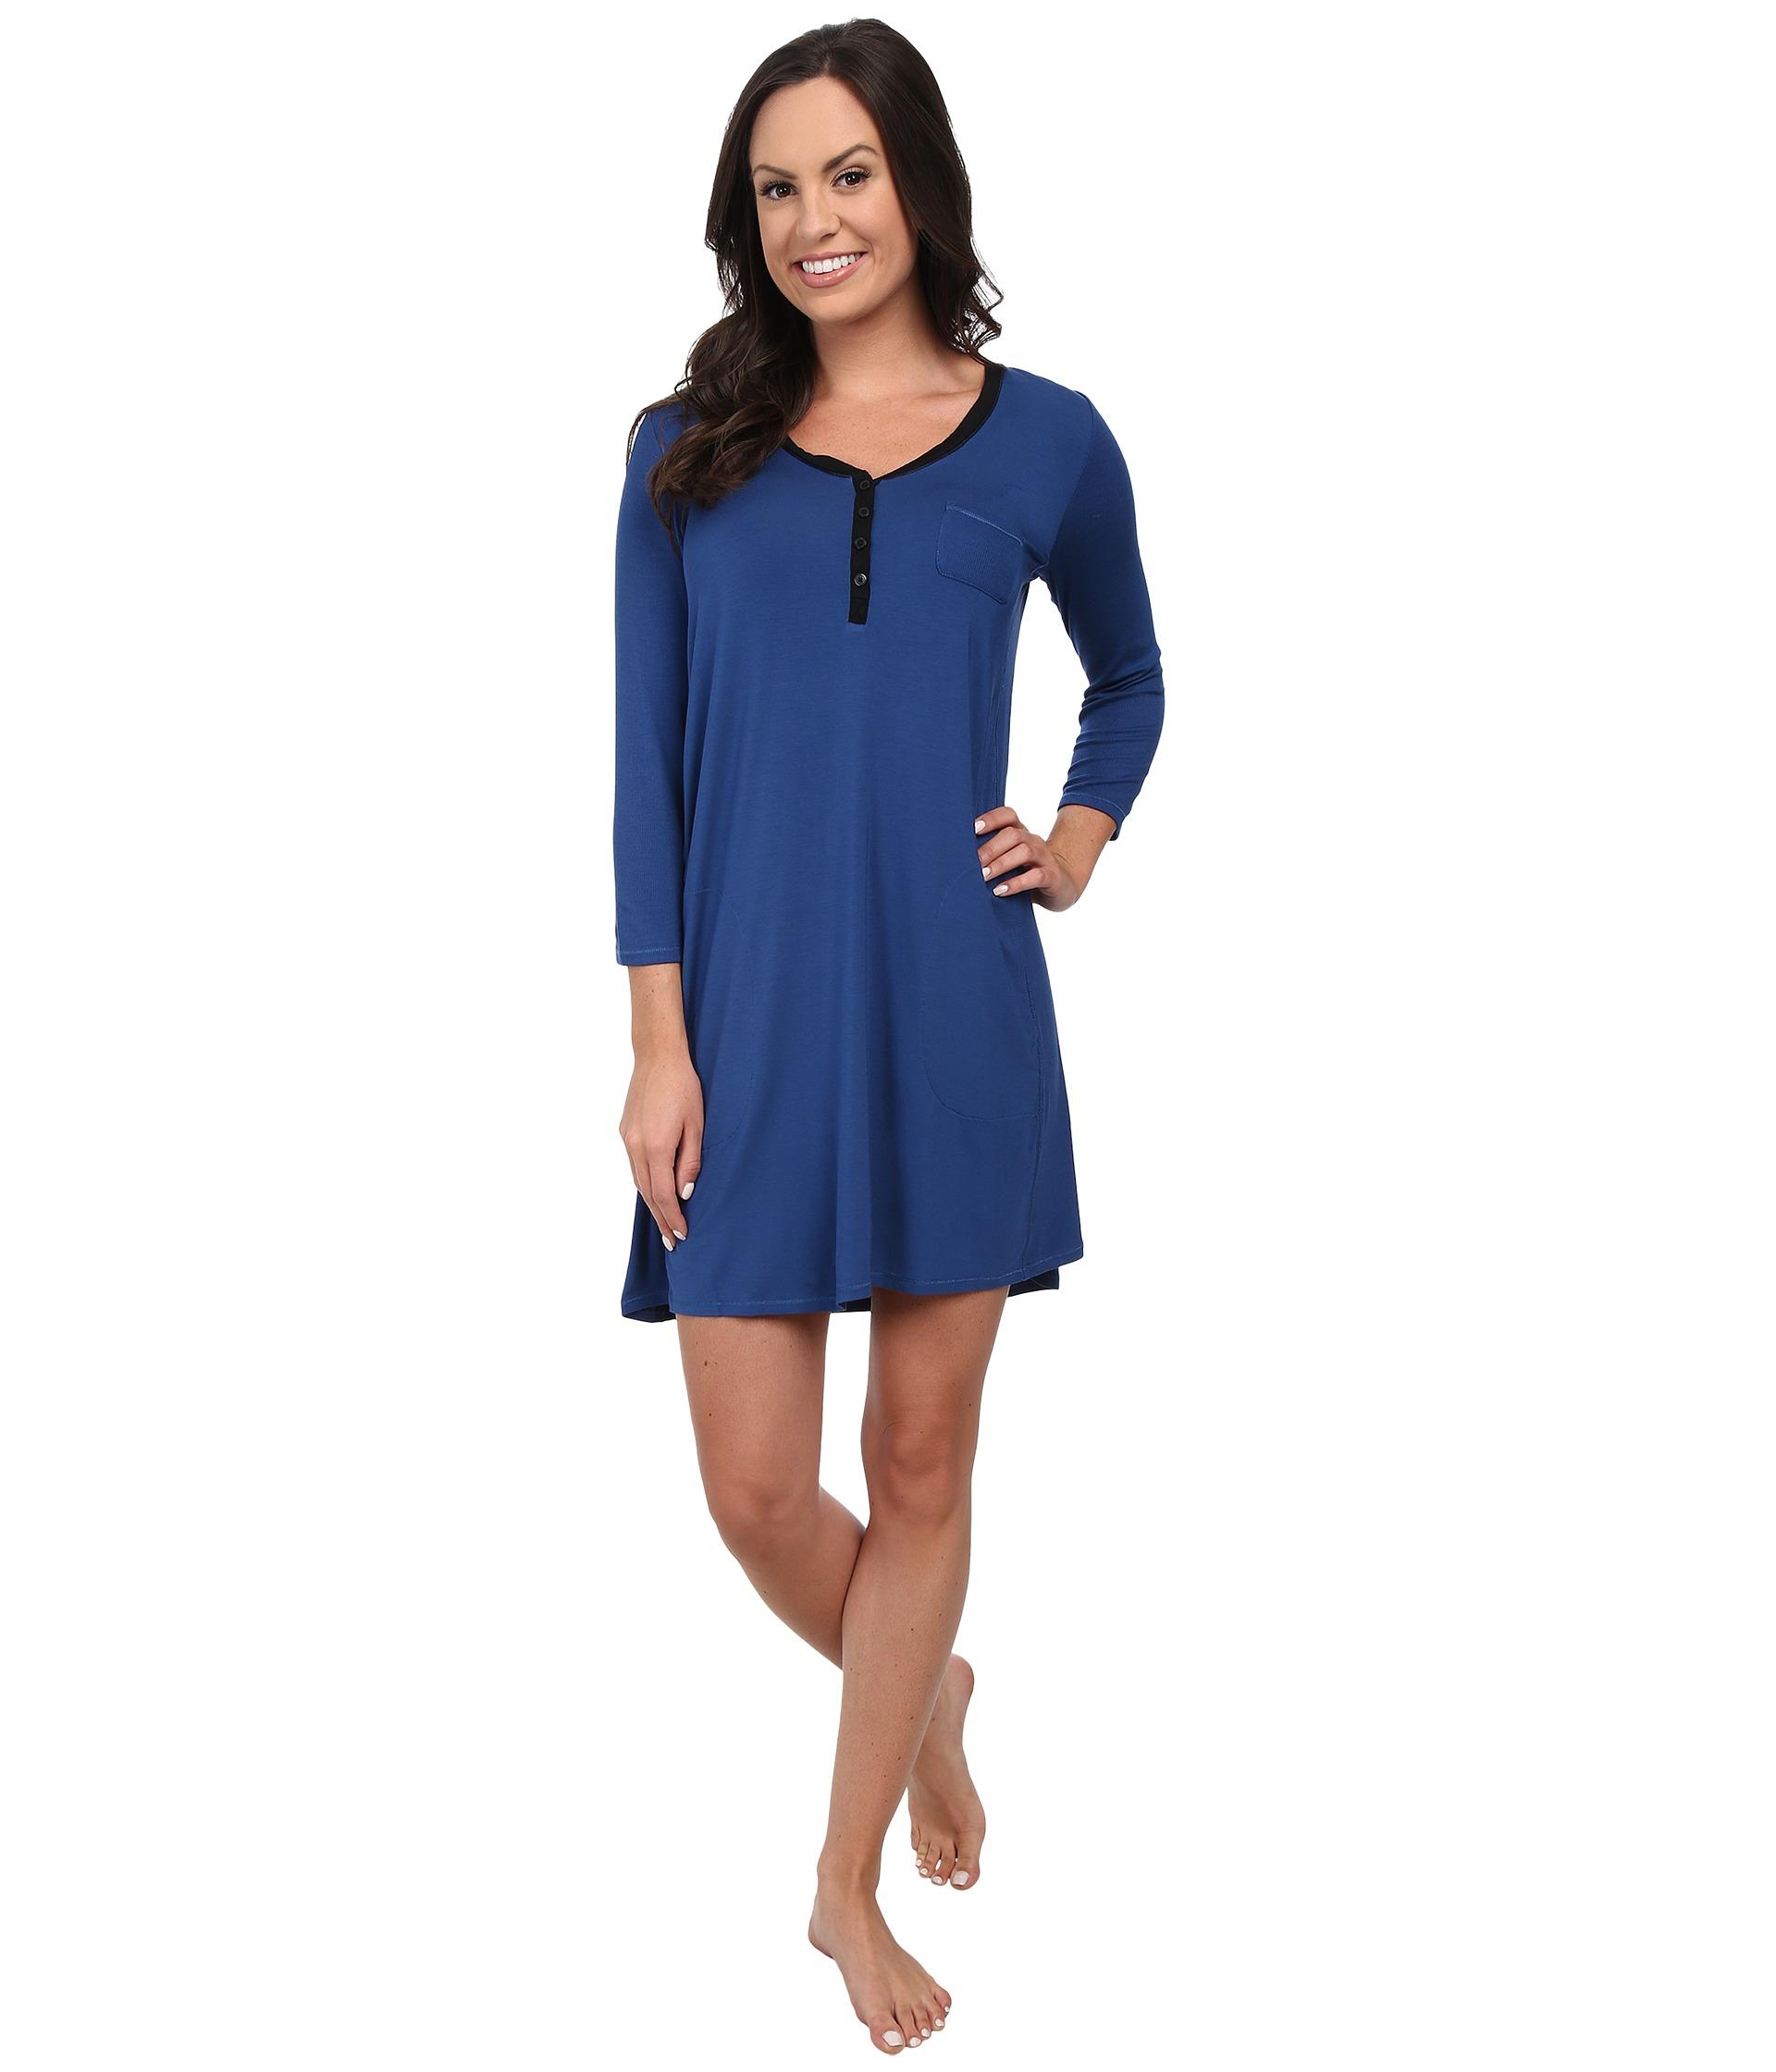 Lyst - Dkny Urban Essentials 3 4 Short Sleeve Sleepshirt in Blue ea2f5d2d9